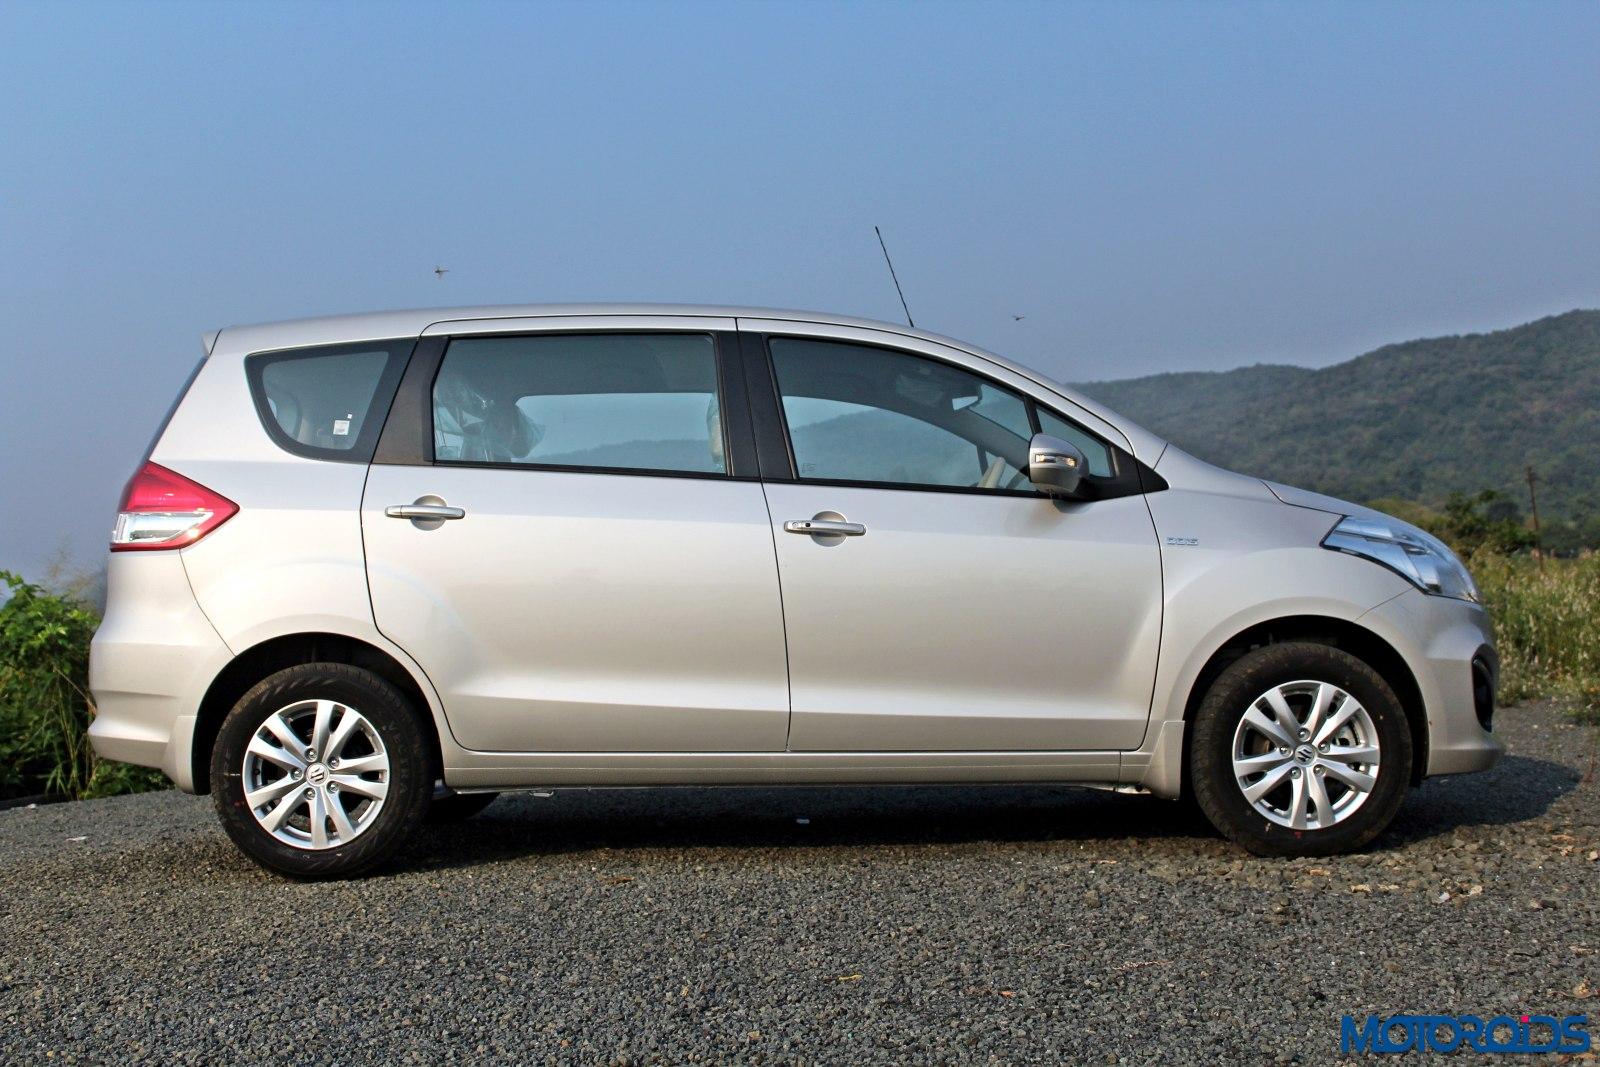 New 2015 Maruti Suzuki Ertiga Facelift ZDi+ Review: In the ...